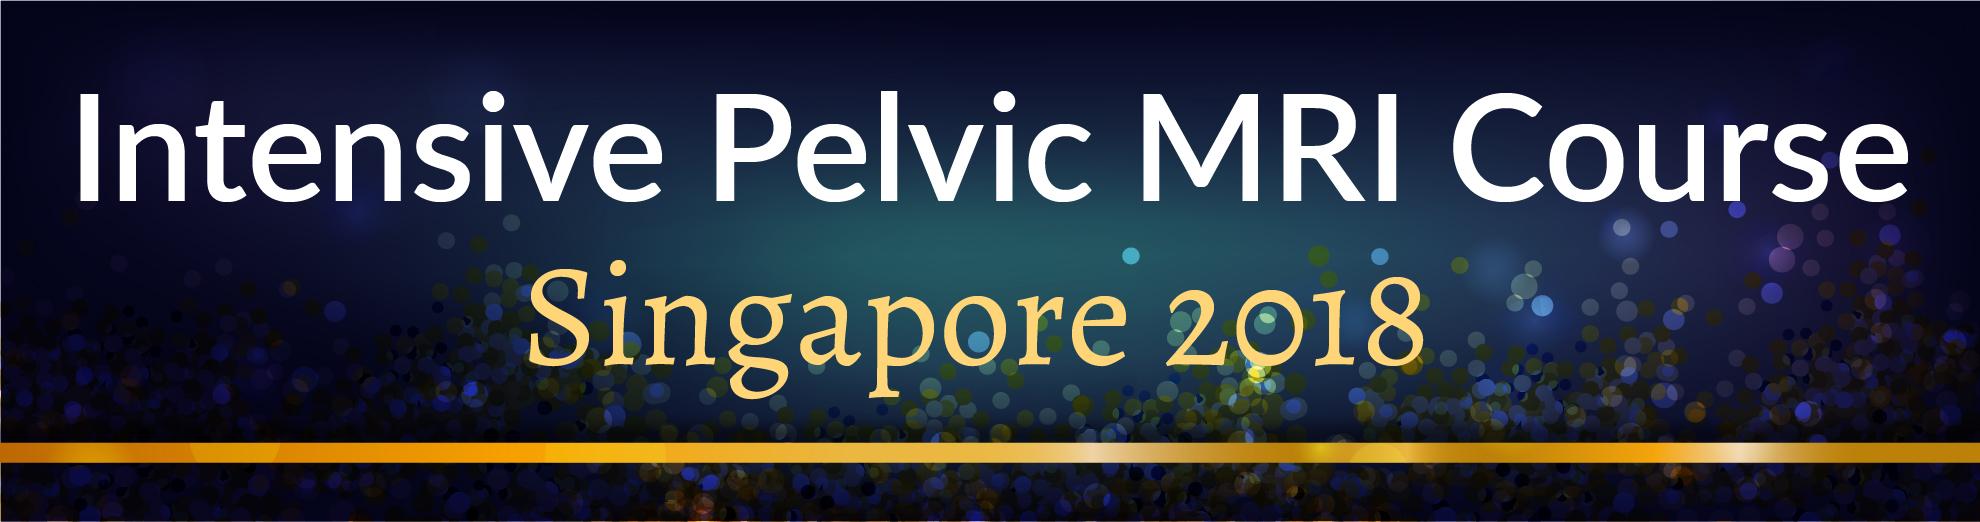 Intensive Pelvic MRI Course | Singapore 2018